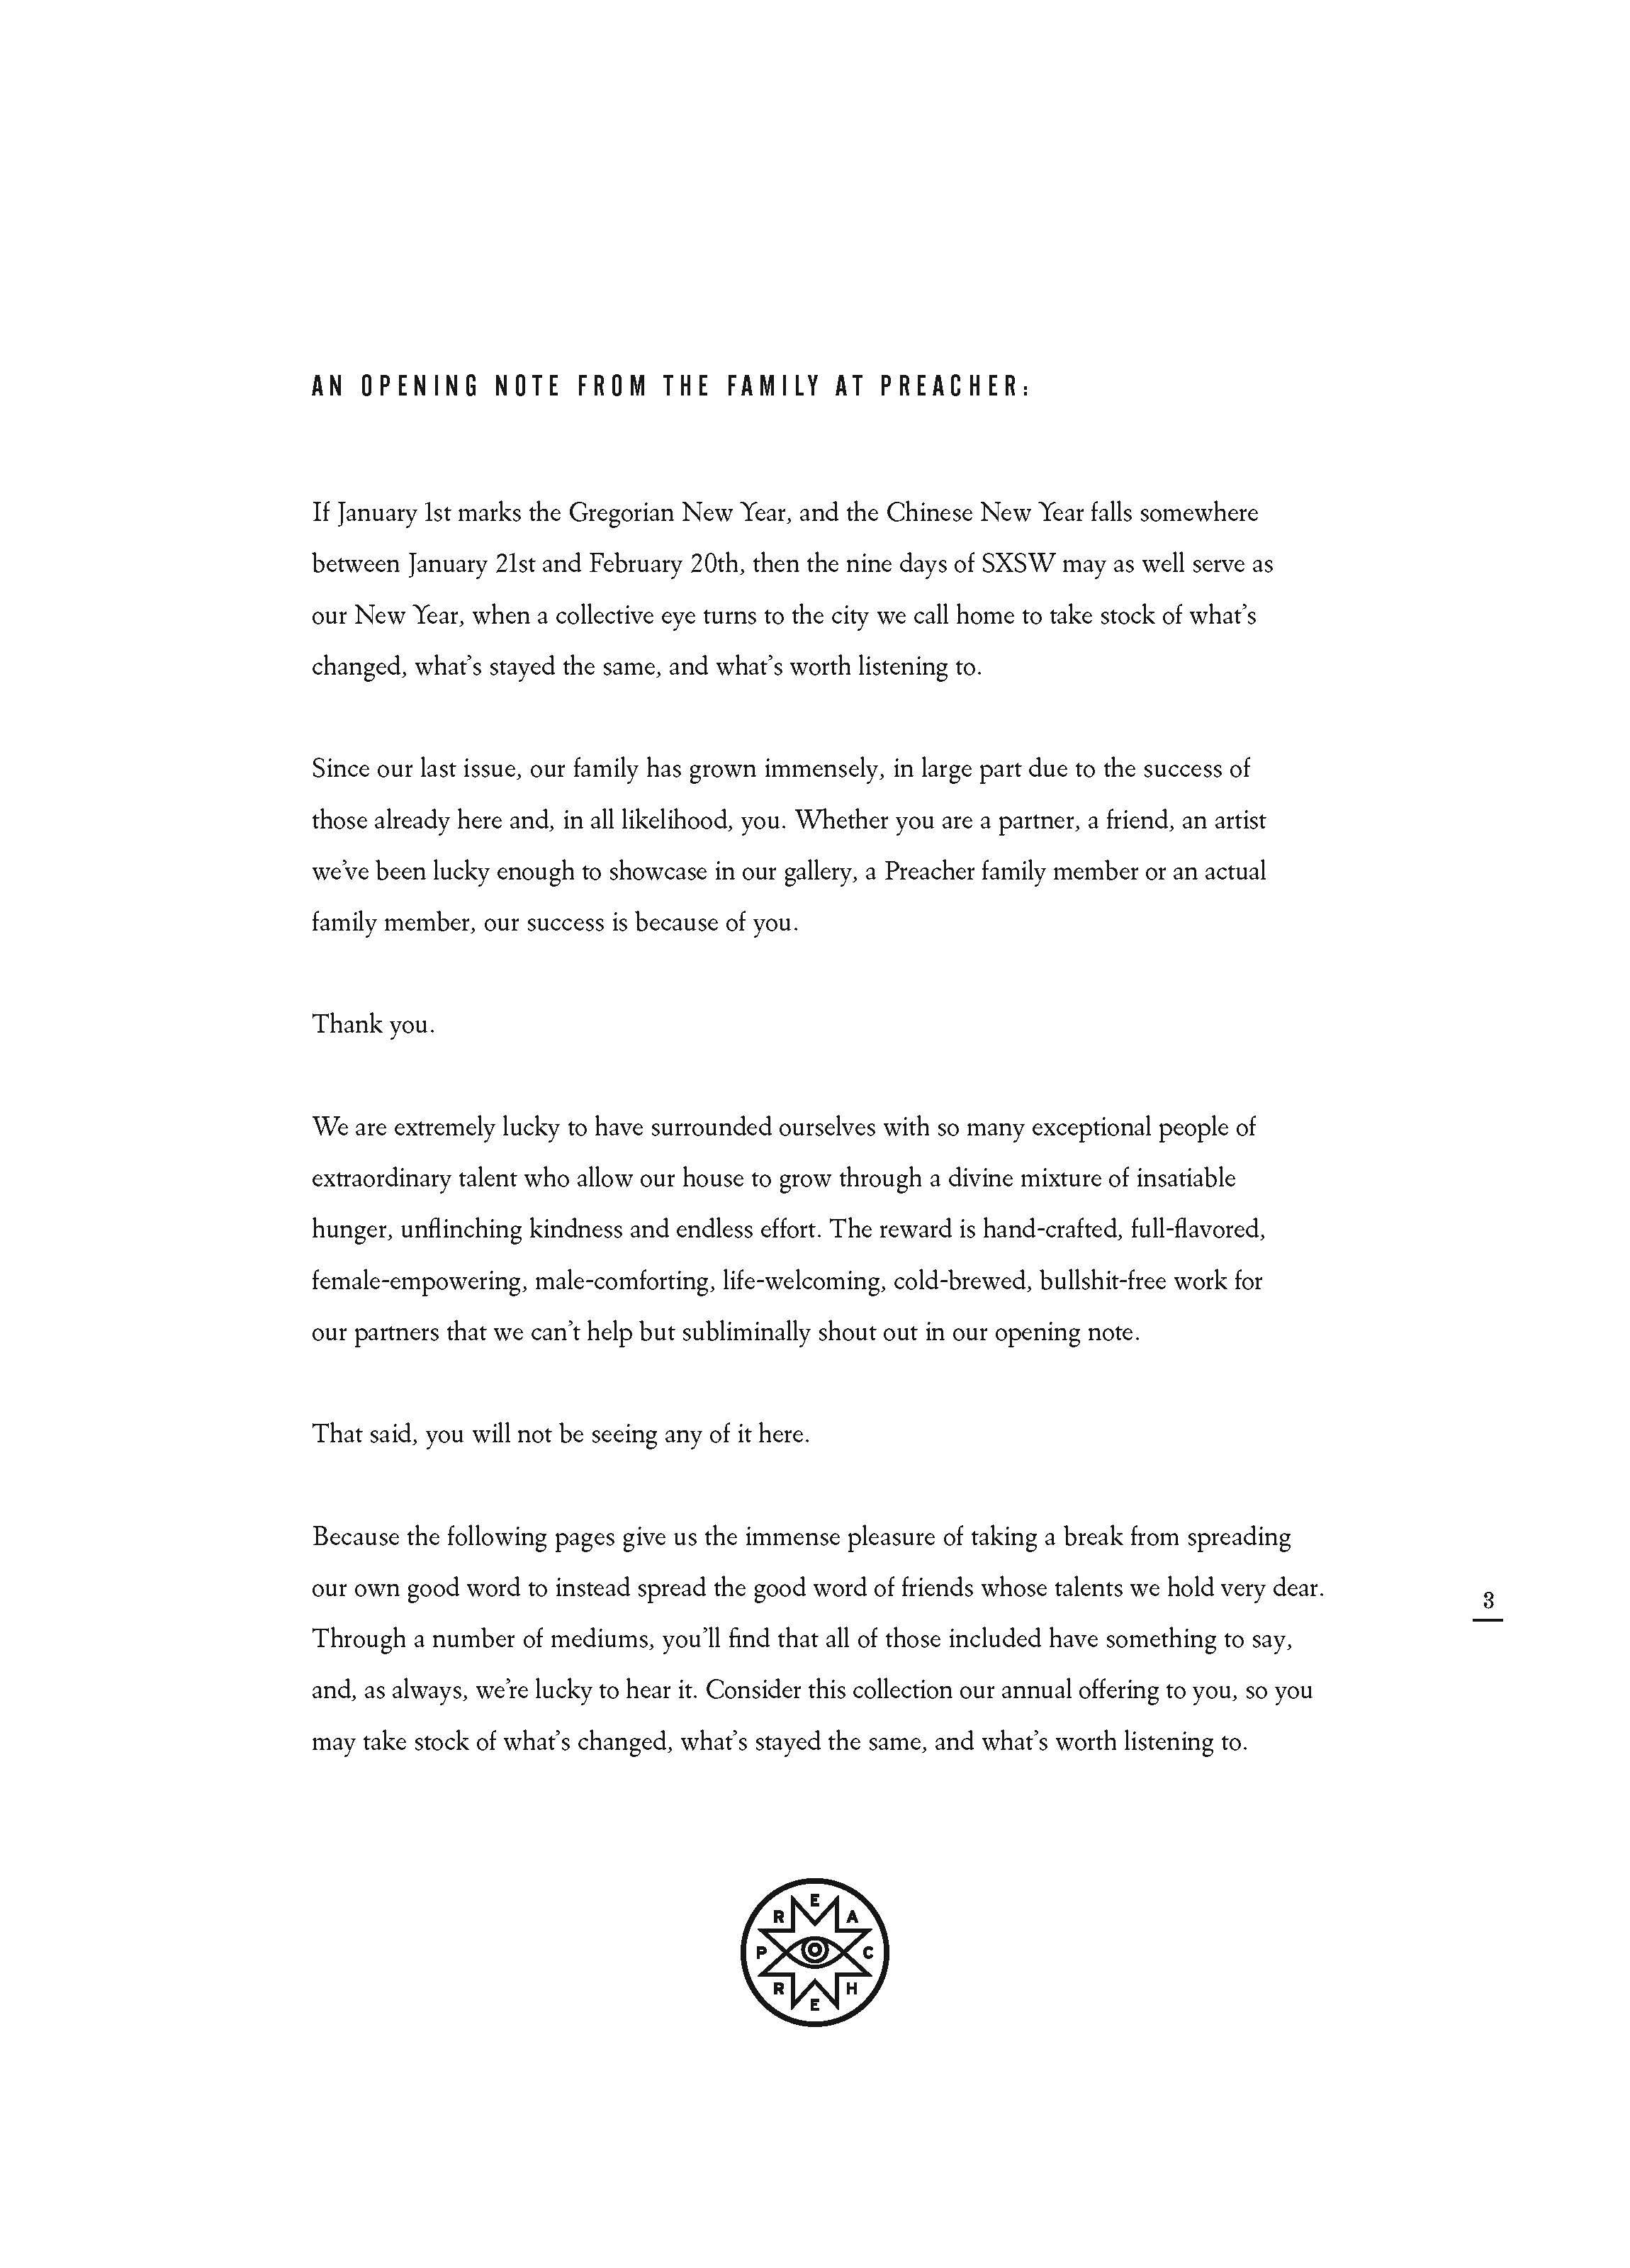 The Good Word Susannah Haddad_Page_03.jpg